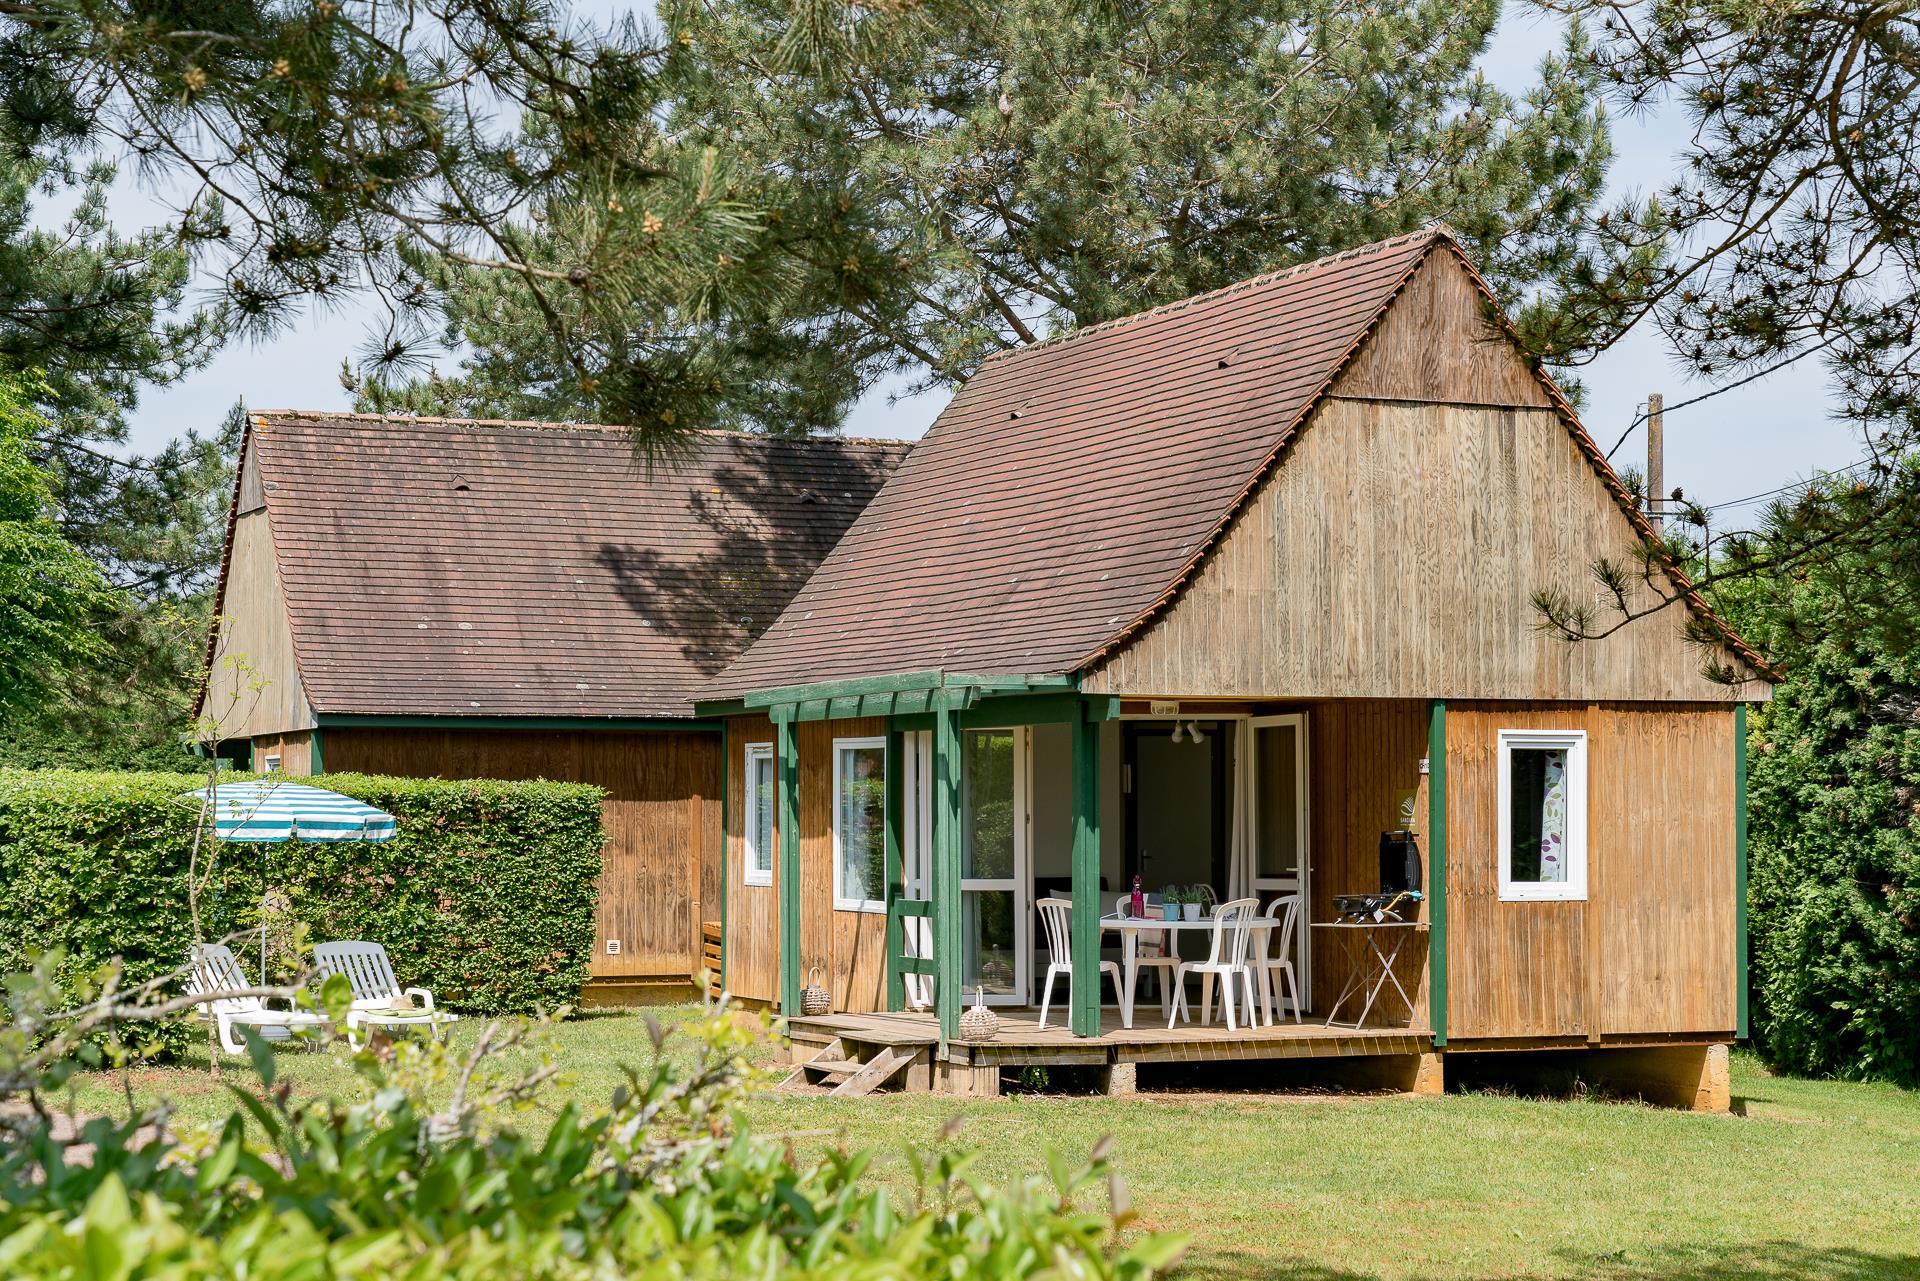 Location - Chalet Reve 2 Chambres *** - Camping Sandaya Les Péneyrals